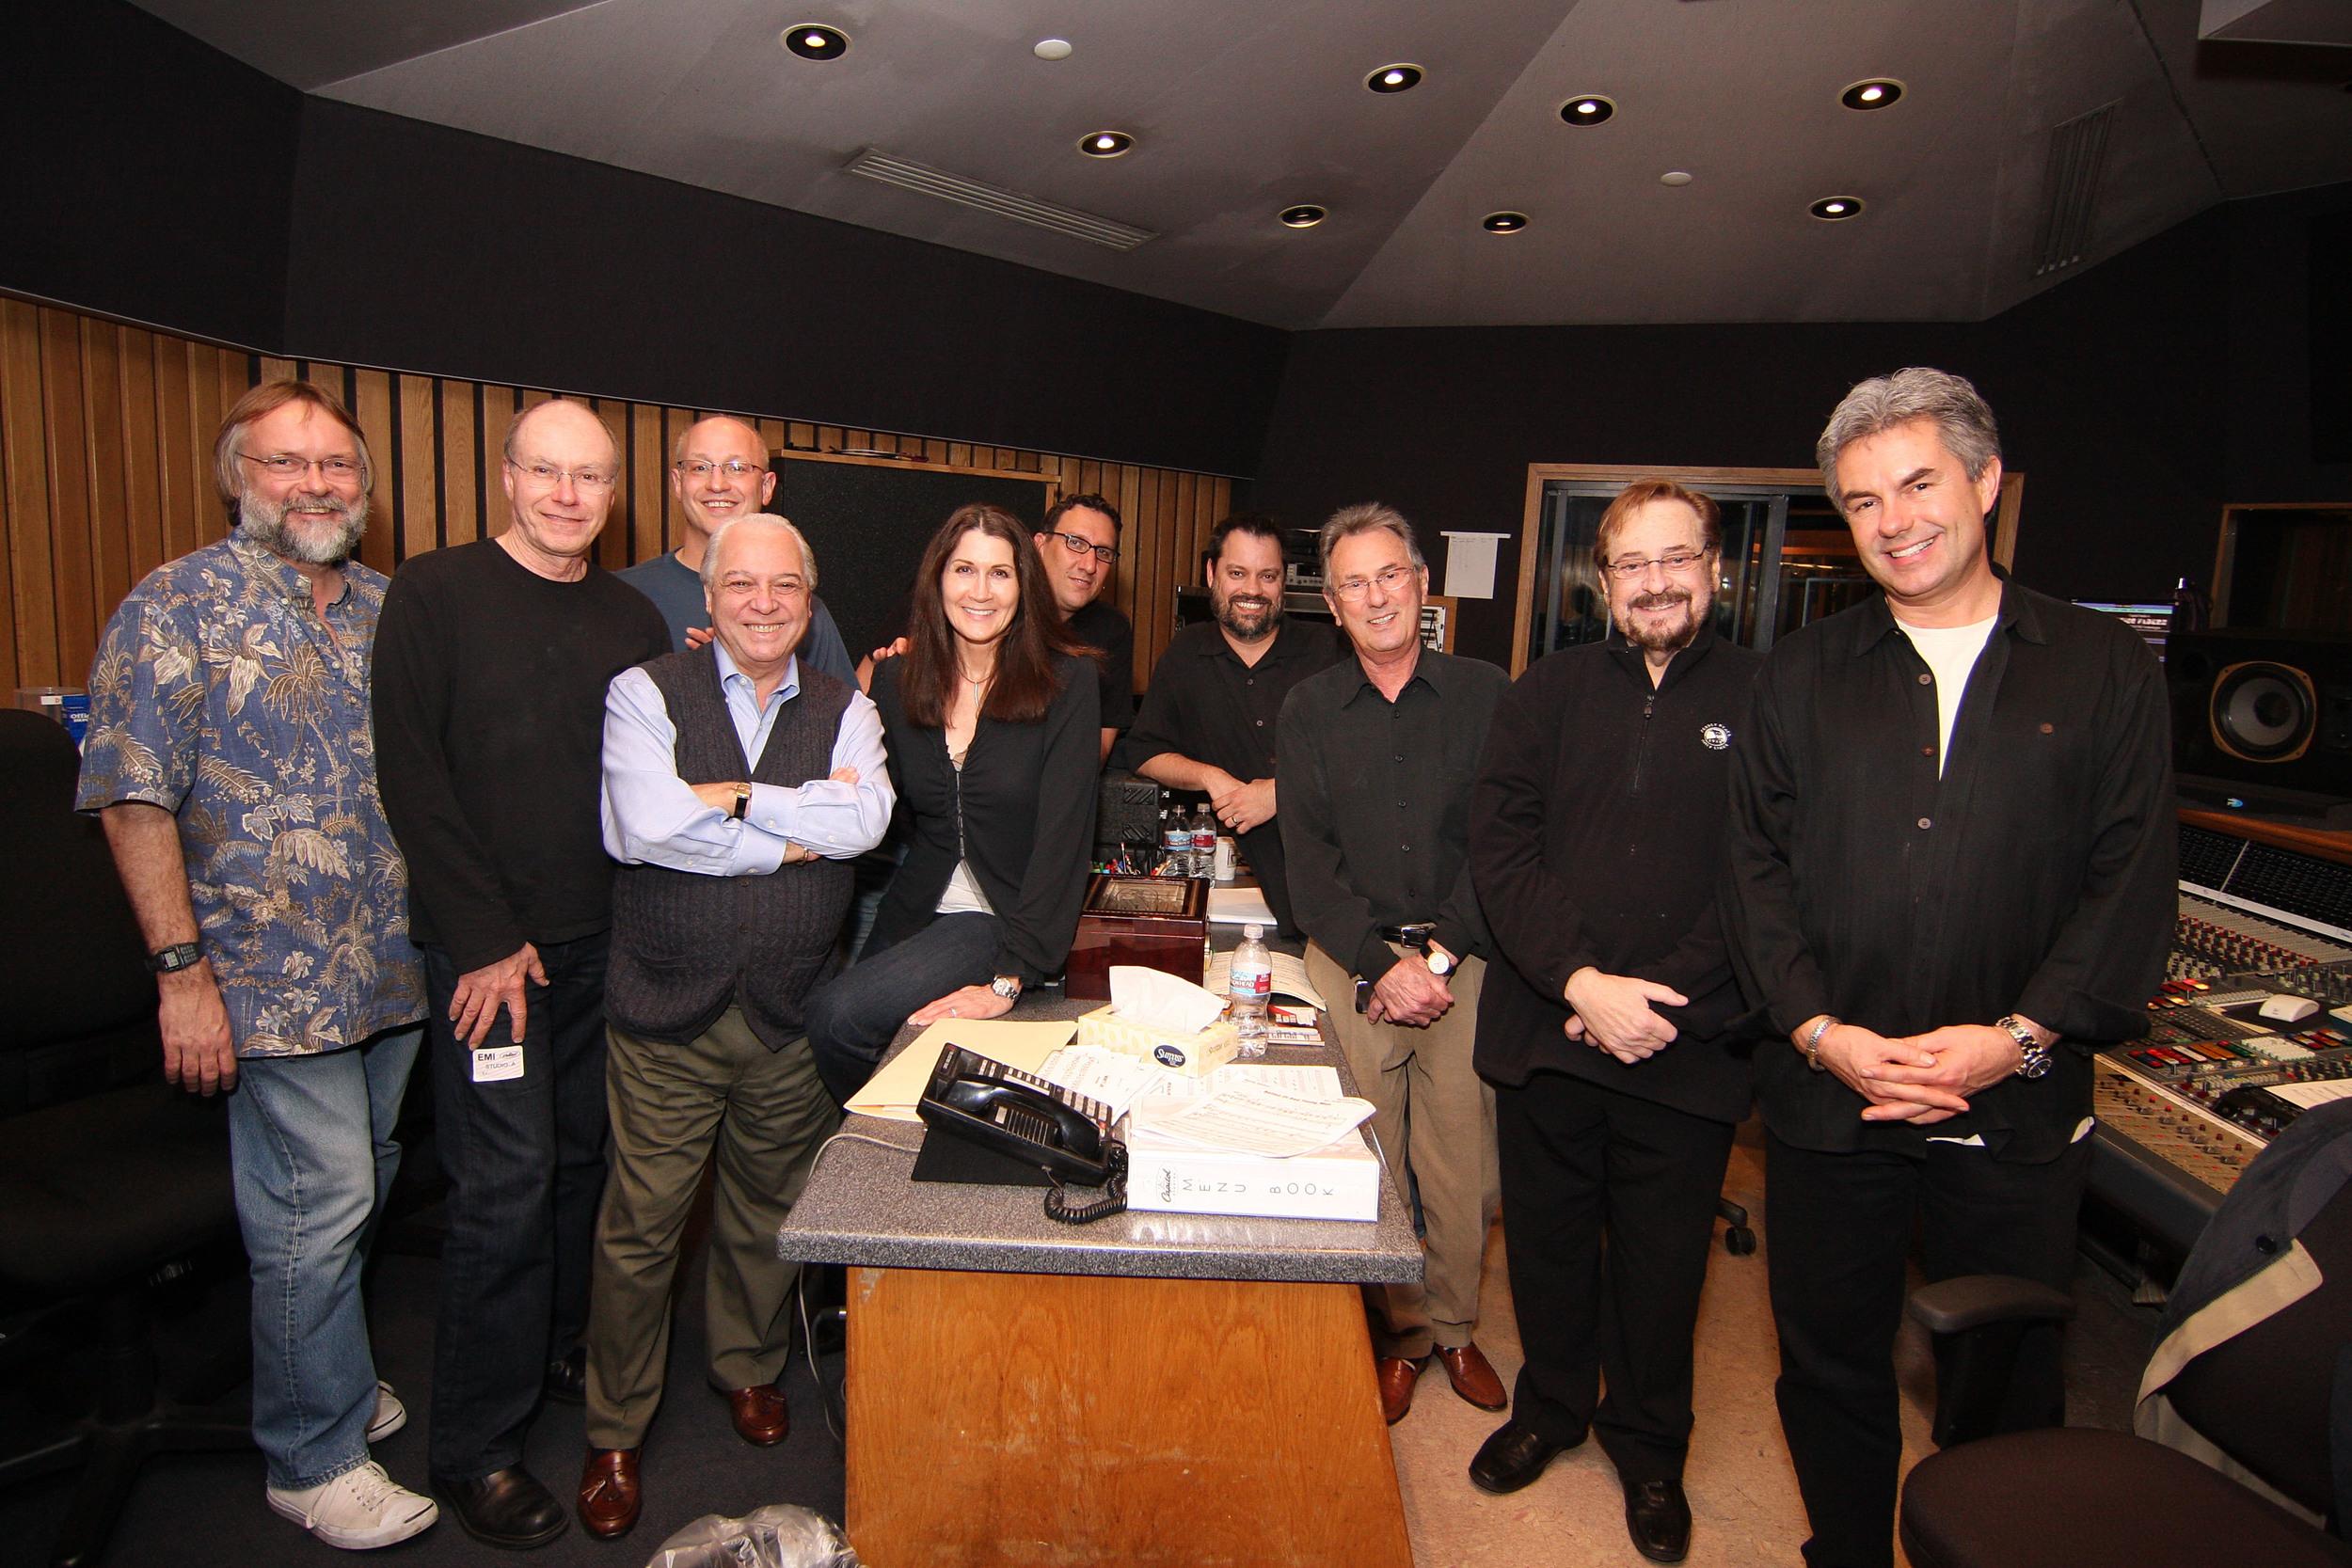 Team Mancini 2008